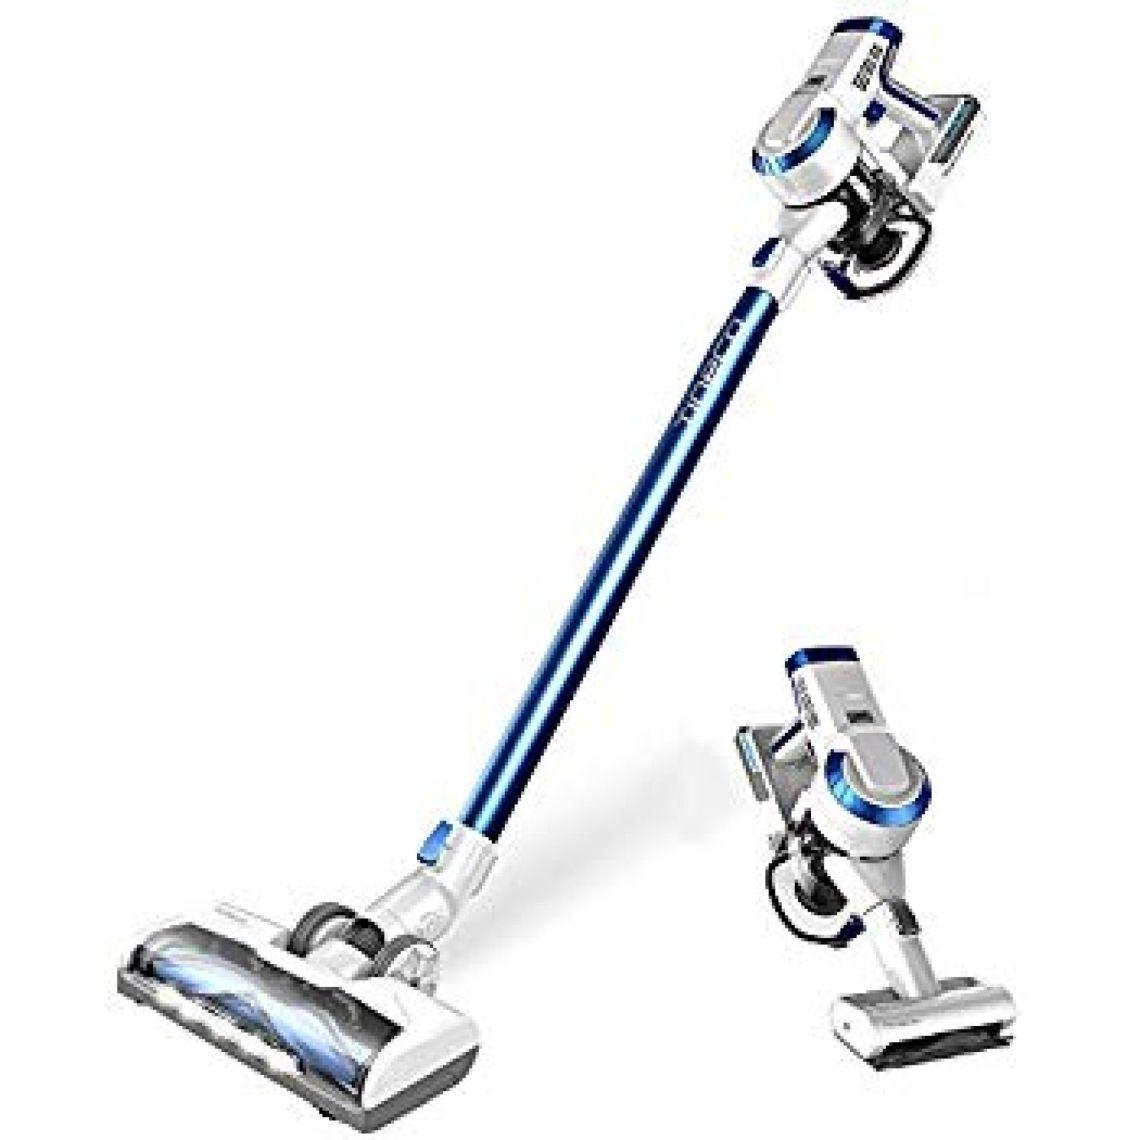 Amazon.com - tineco A10 Hero Cordless Vacuum Cleaner, 350W Digital Motor, Lithium Battery, LED Power Brush, High Power Handheld, Lightweight Vacuum, Stick Vacuum Cordless -